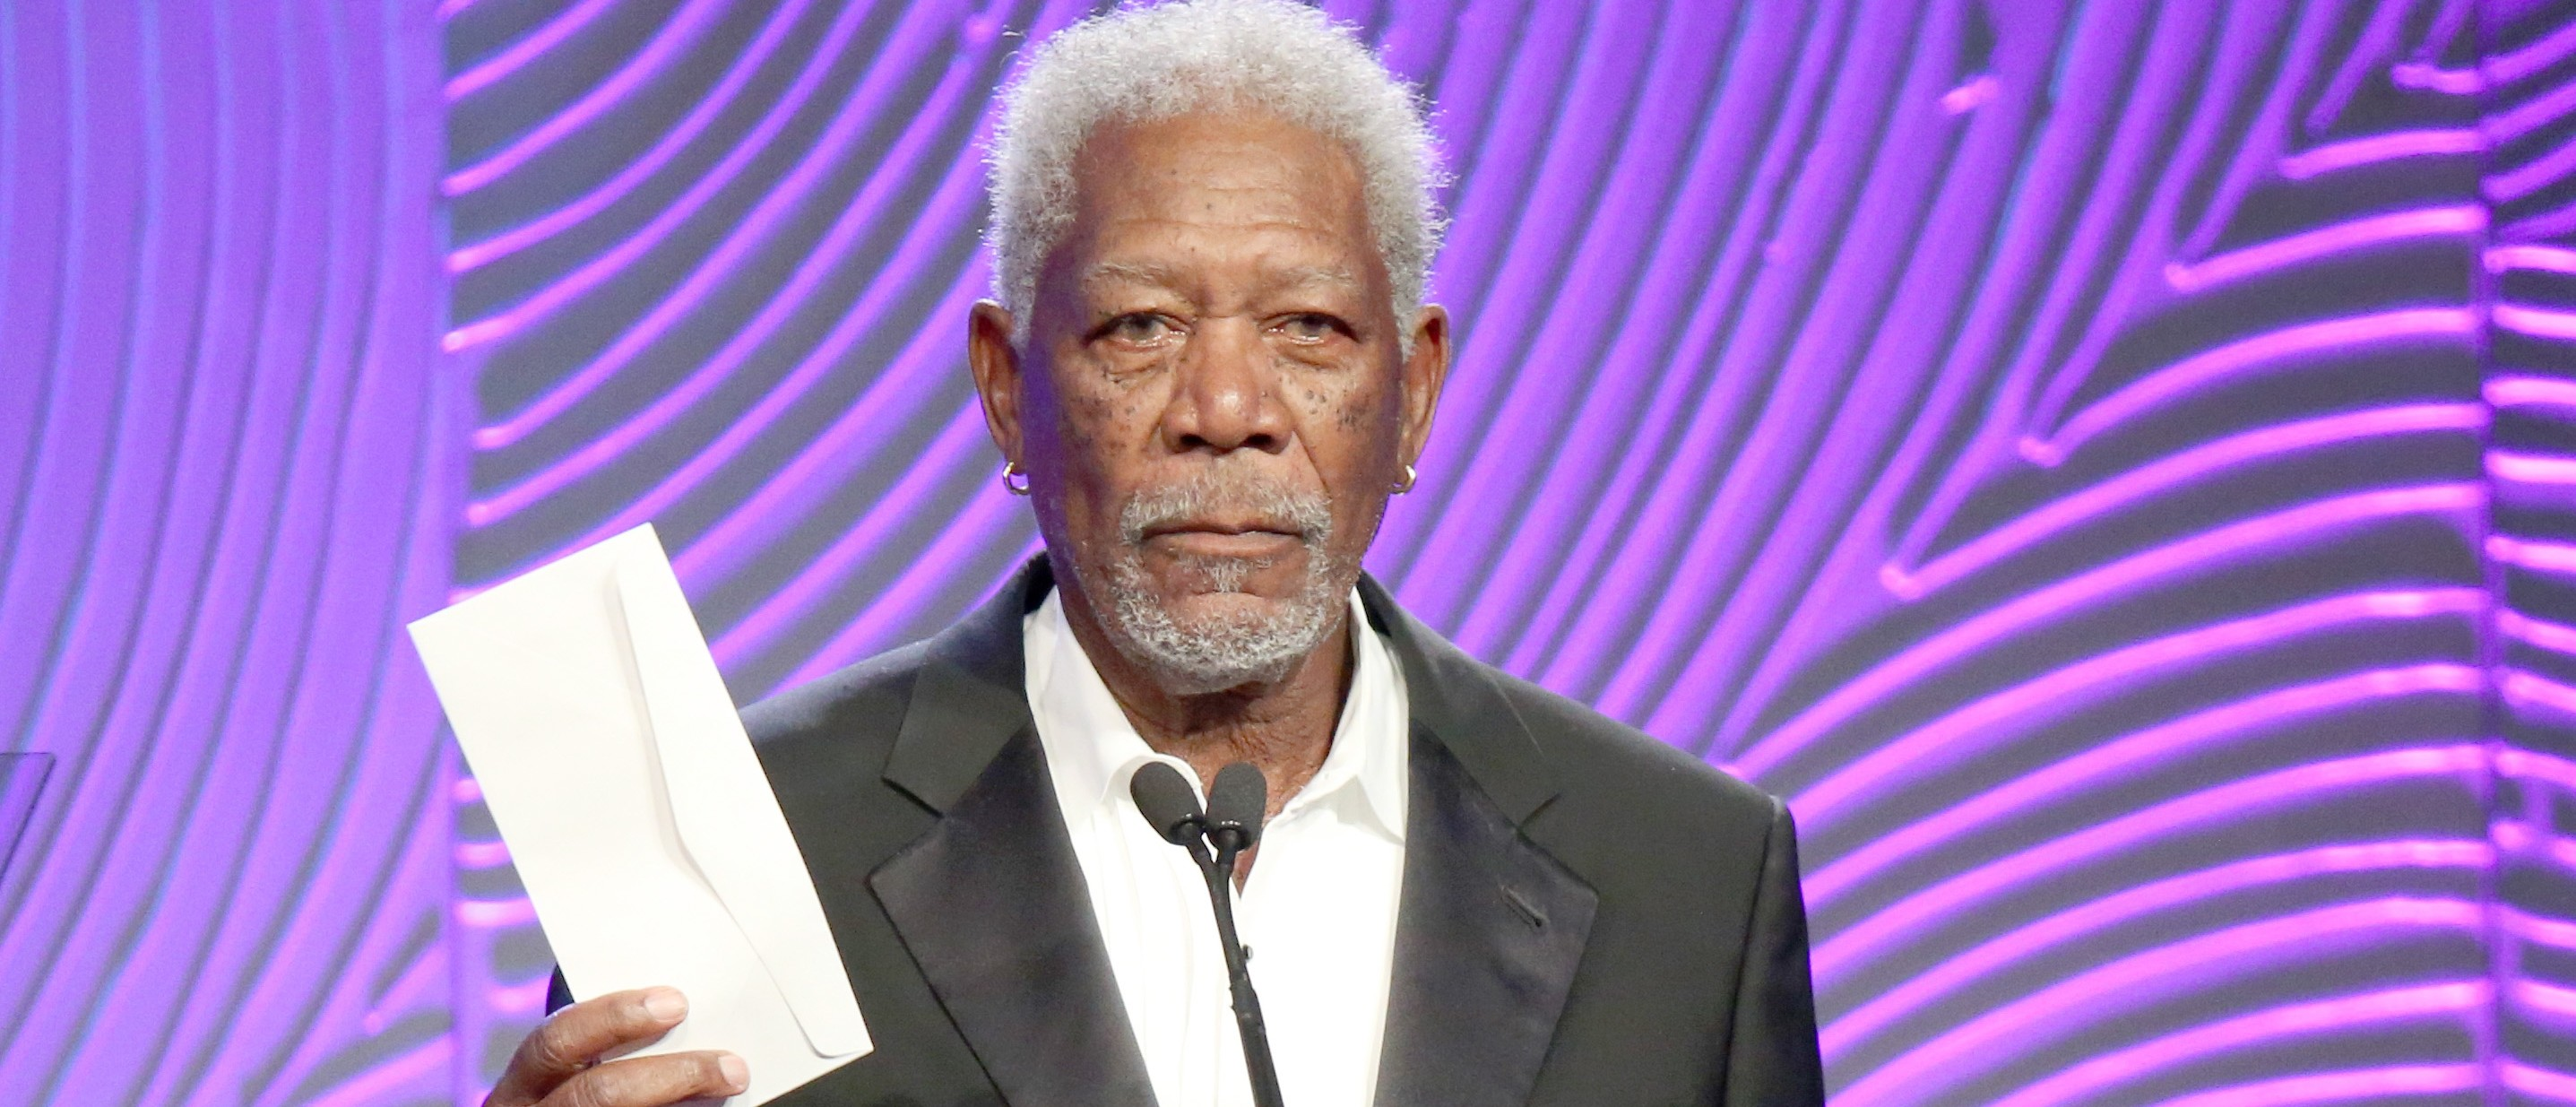 Morgan Freeman does ad for Hillary Clinton